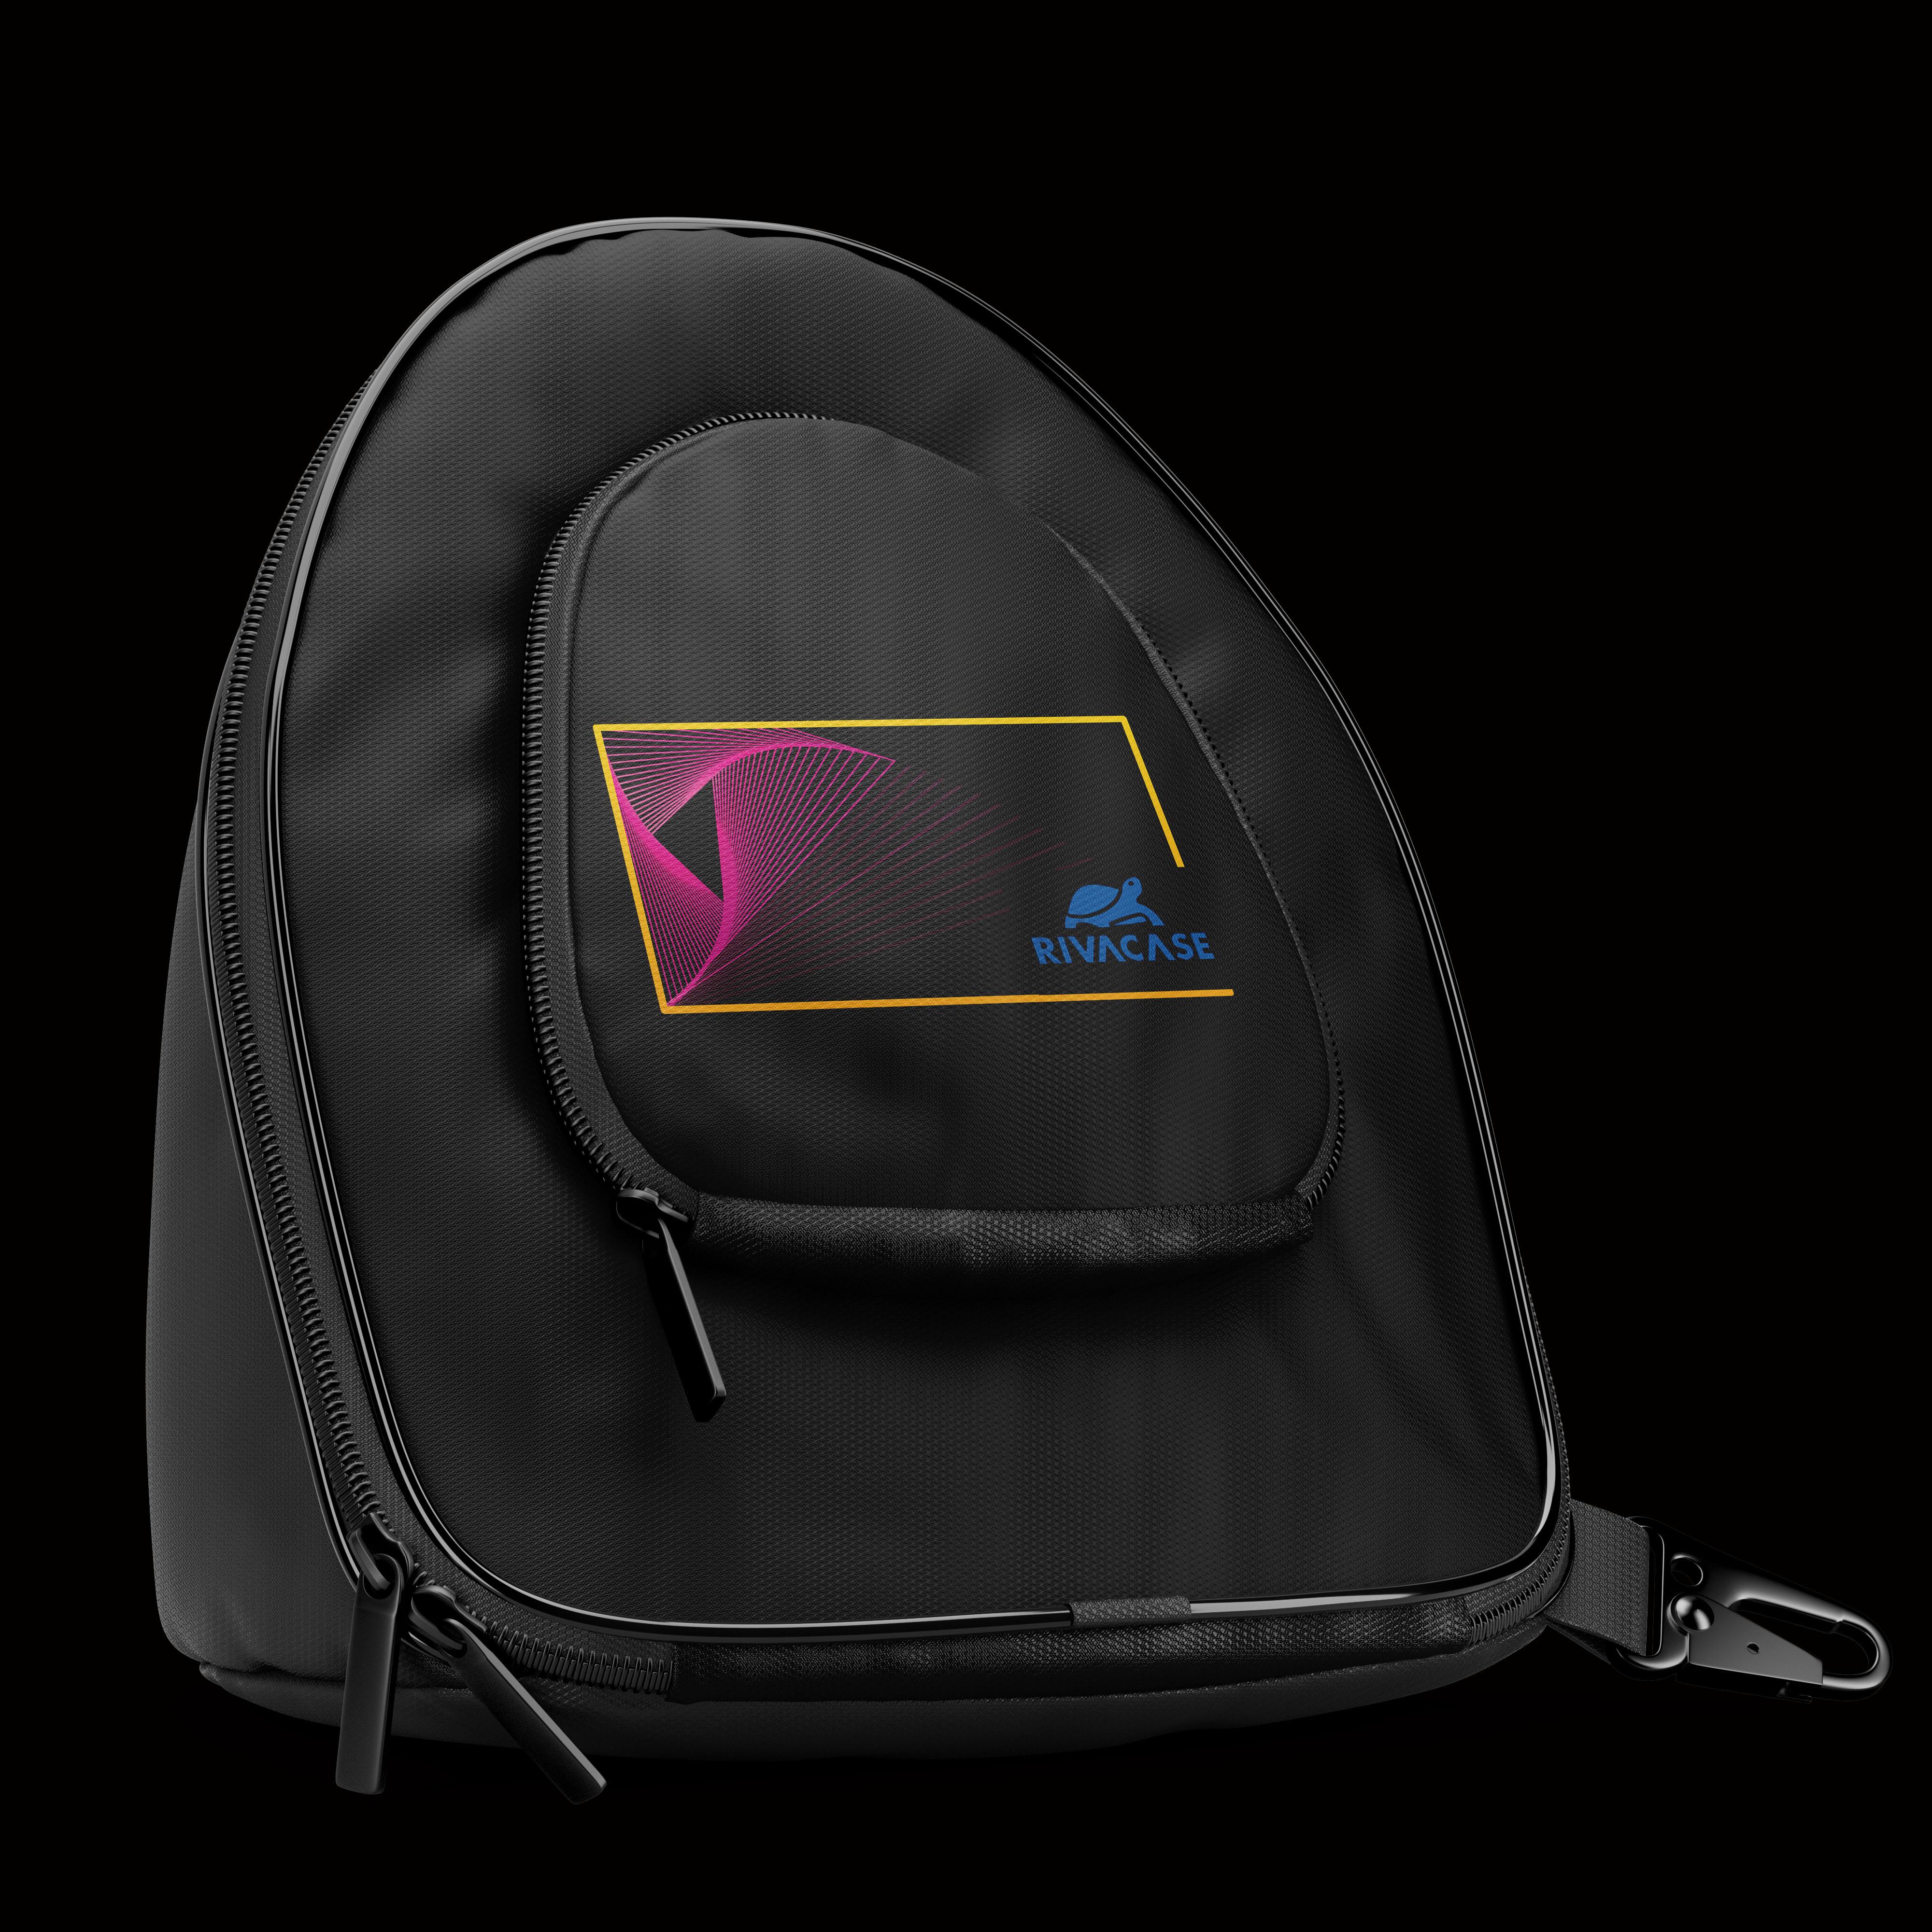 Конкурс на создание оригинального принта для рюкзаков фото f_5285f8473dabfa58.jpg